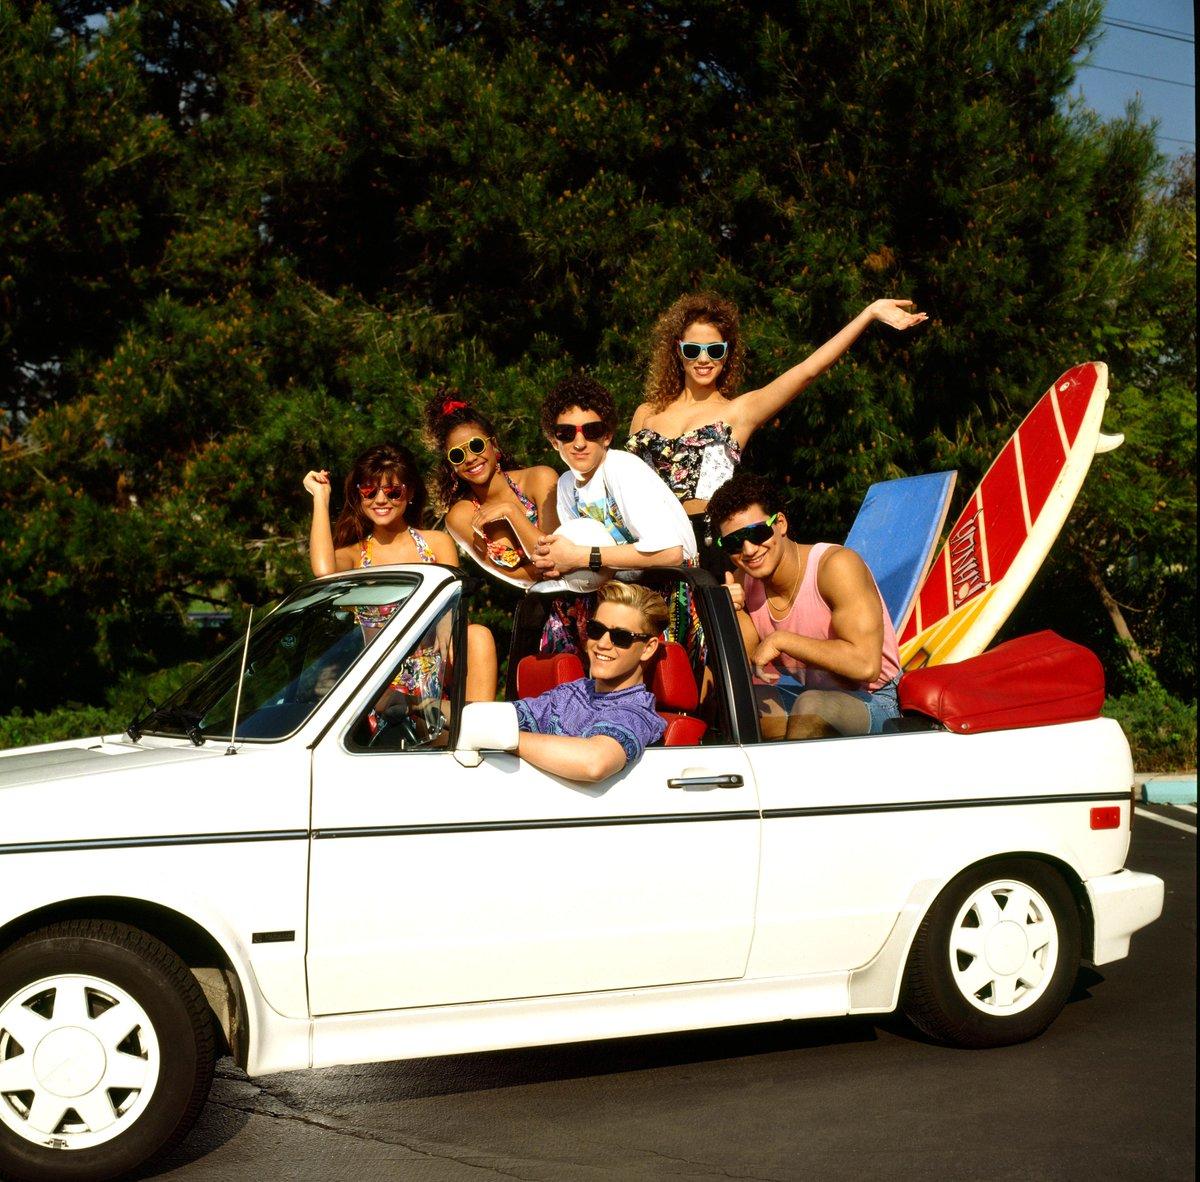 Zack&Kelly&Slater&Jessie&Lisa&Screech&Belding.Happy 30th anniversary, #SavedByTheBell!